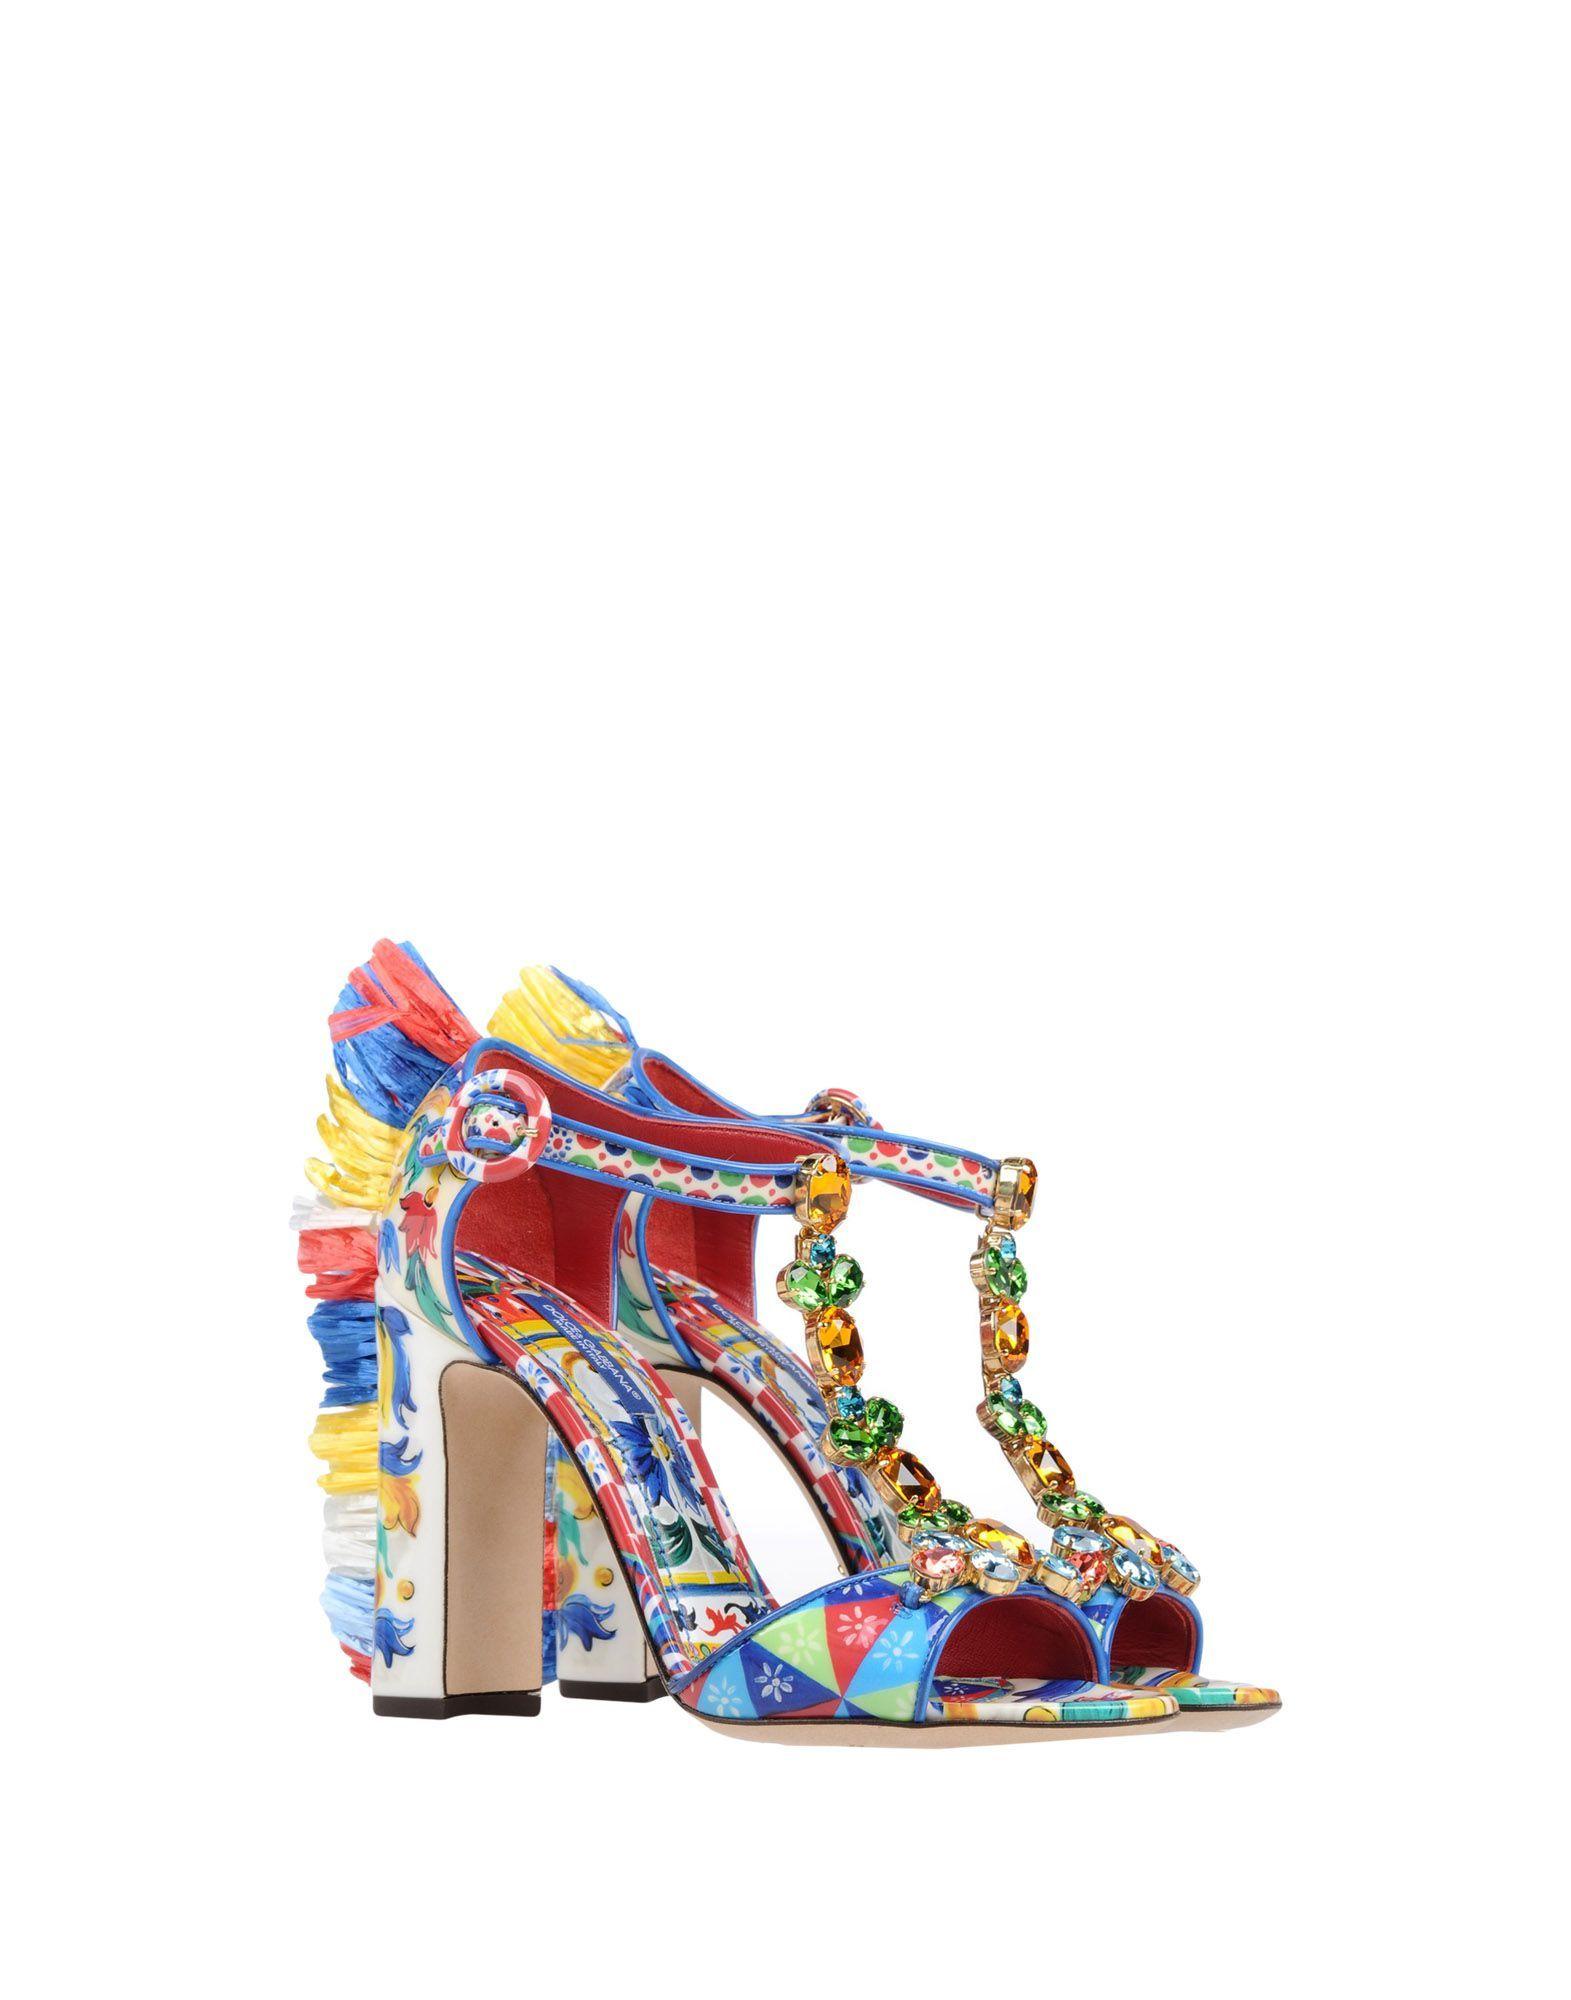 4f84ad55c35 Πέδιλο Dolce & Gabbana Γυναίκα - Πέδιλα Dolce & Gabbana στο YOOX -  11465748XX